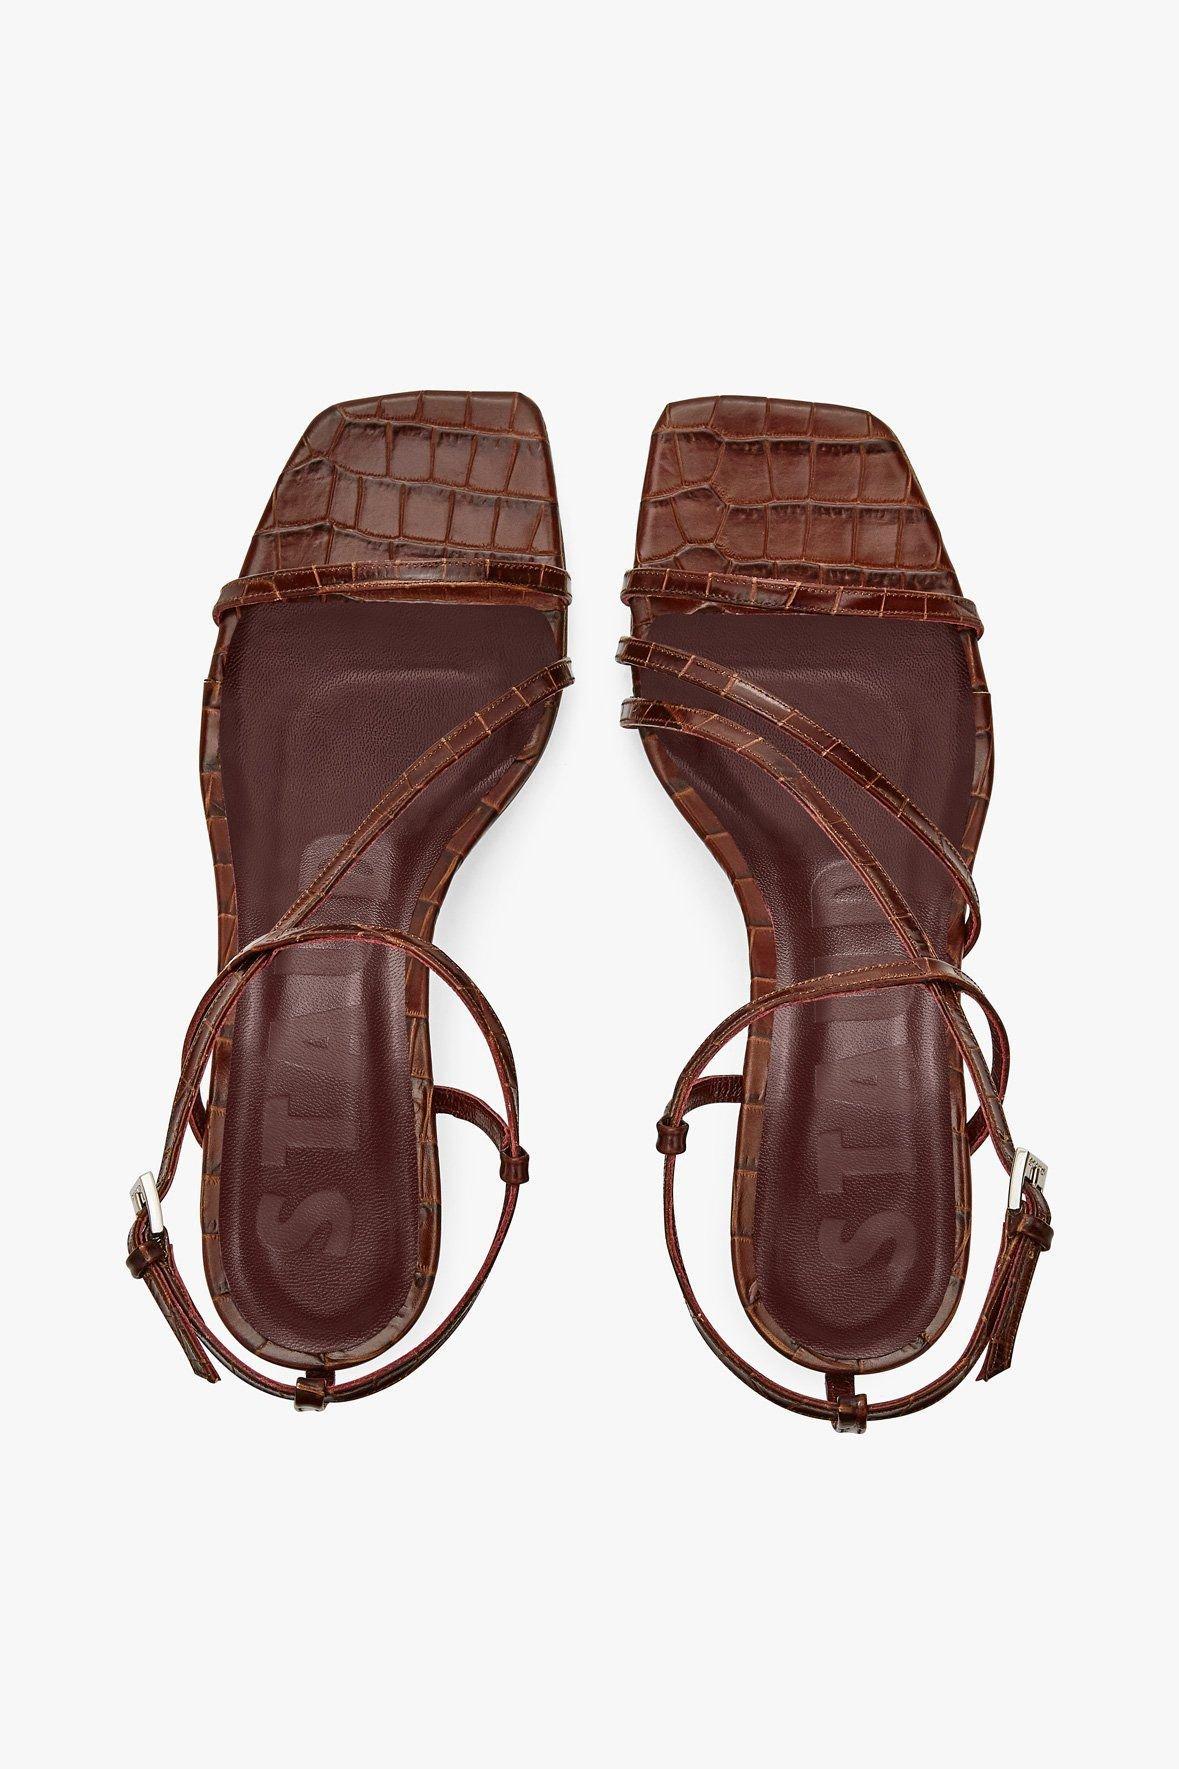 STAUD Shoes | GITA SANDAL | BROWN CROC EMBOSSED